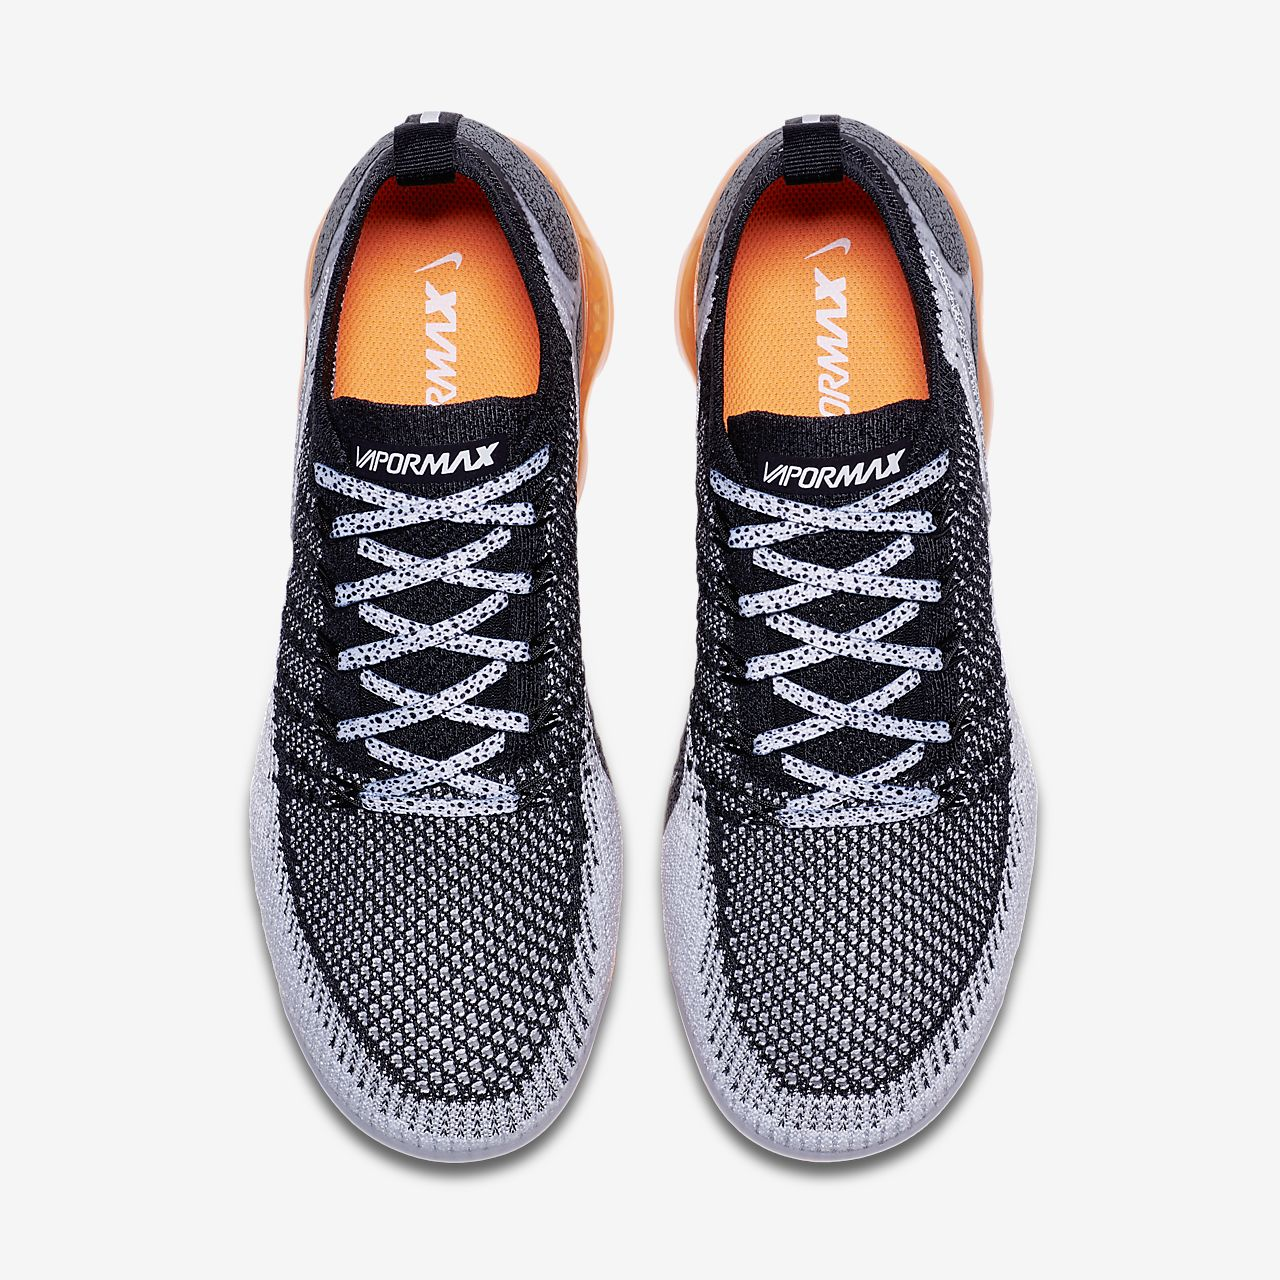 ef7c5ad5b0a0 Nike Air VaporMax Flyknit 2 Safari Shoe. Nike.com PT